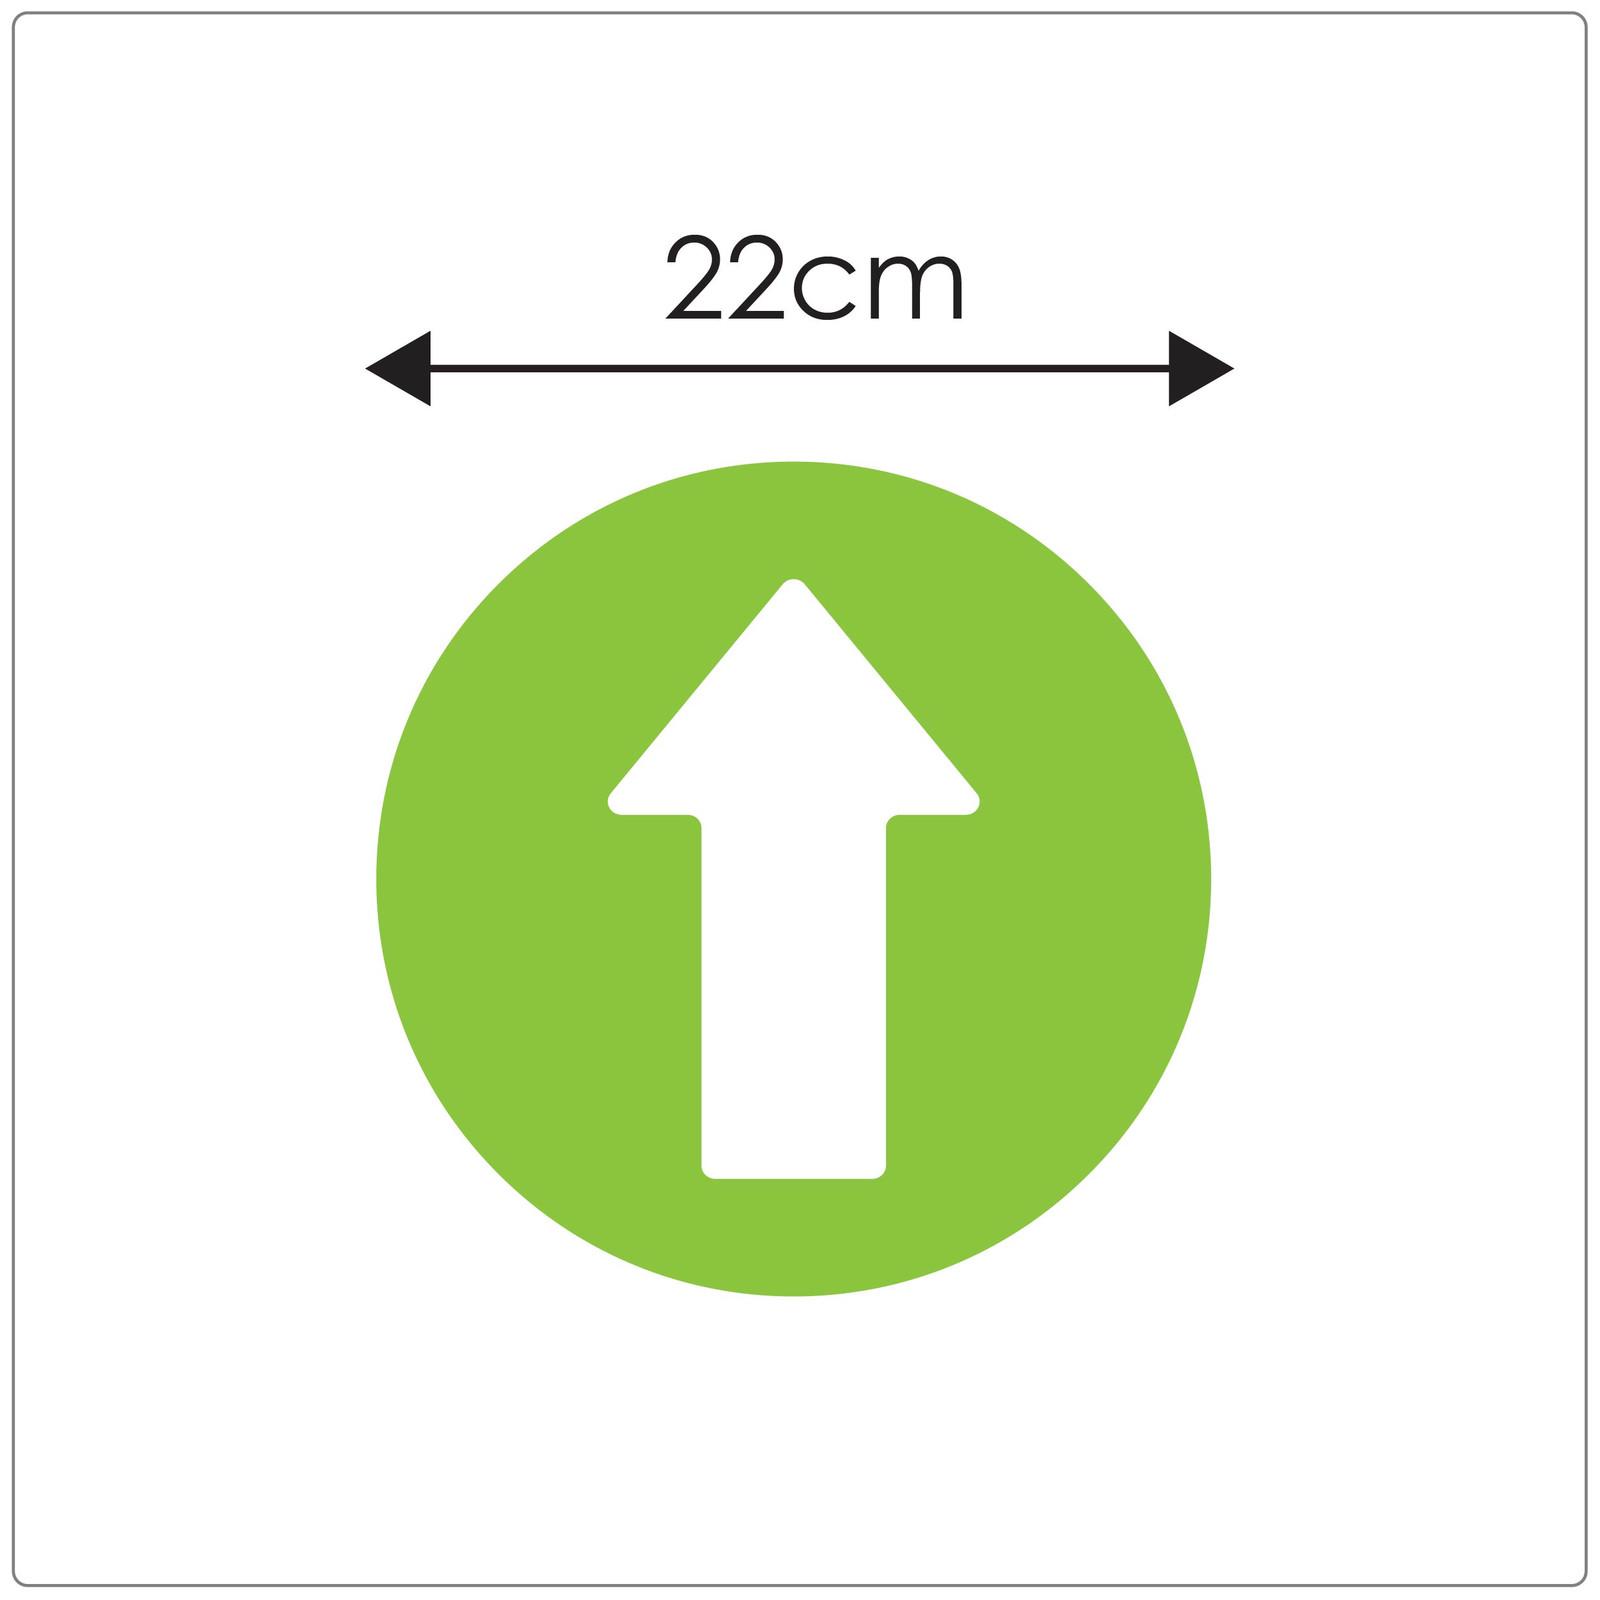 directional arrow social distancing floor sticker for carpet, sizing Self-adhesive Corona virus floor sticker to help social distancing.